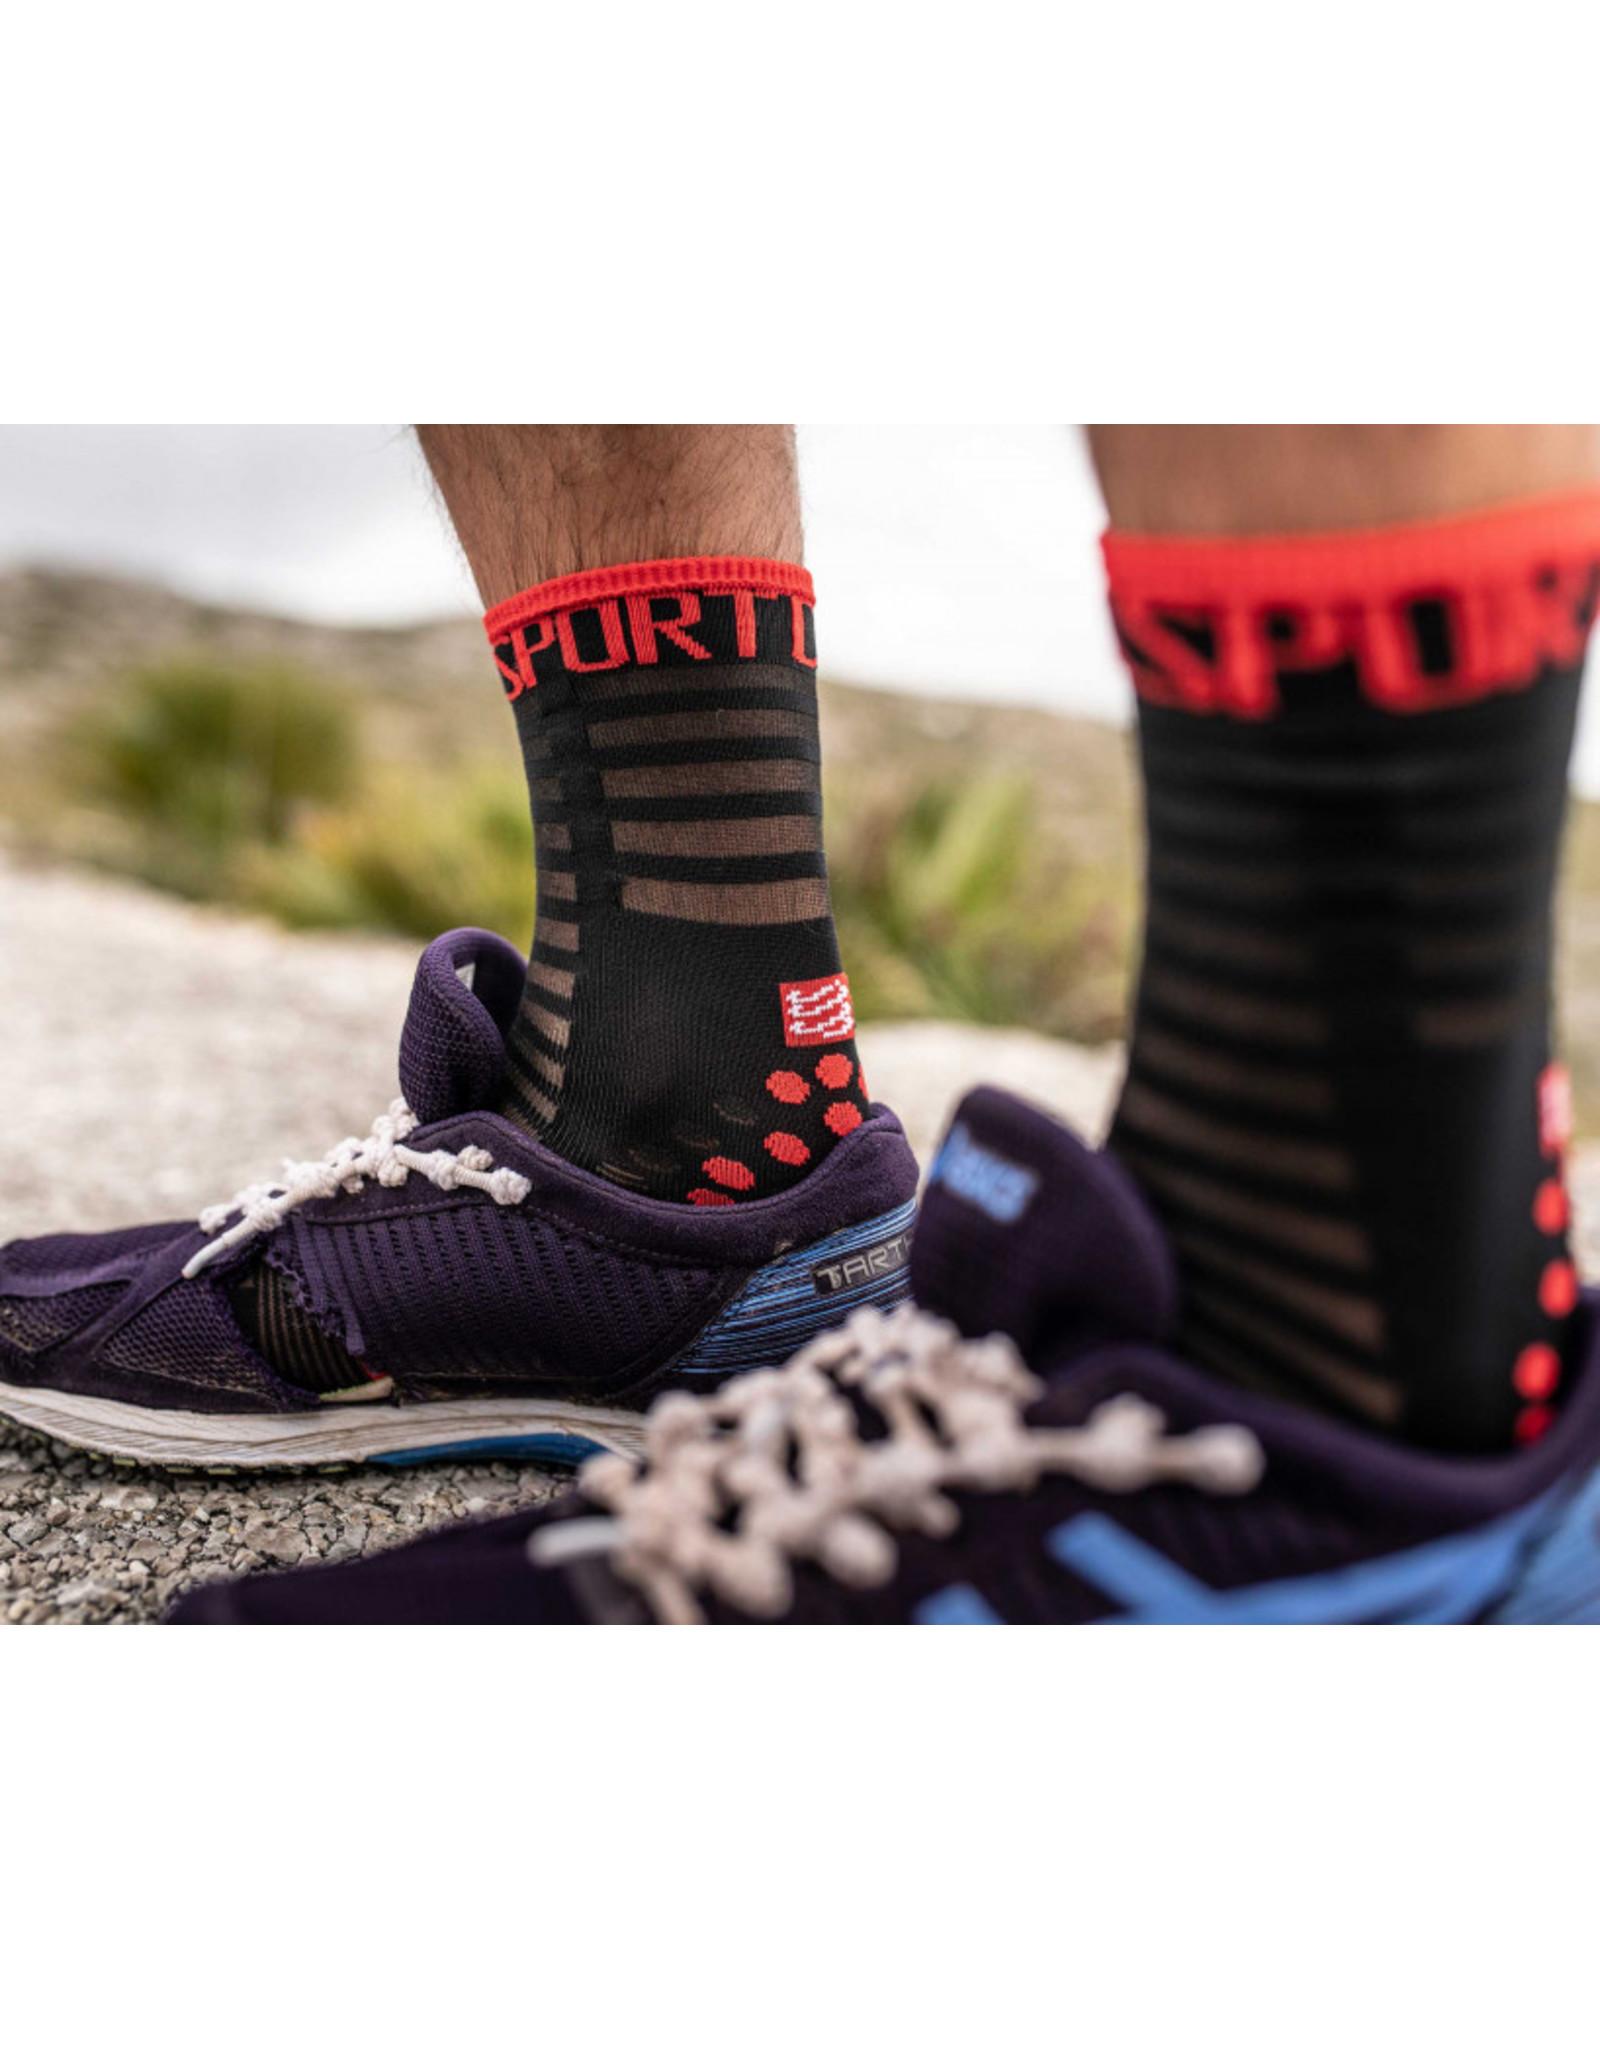 Compressport Pro Racing Socks V3.0 Ultralight Run High Hardloopsokken - Zwart/Rood